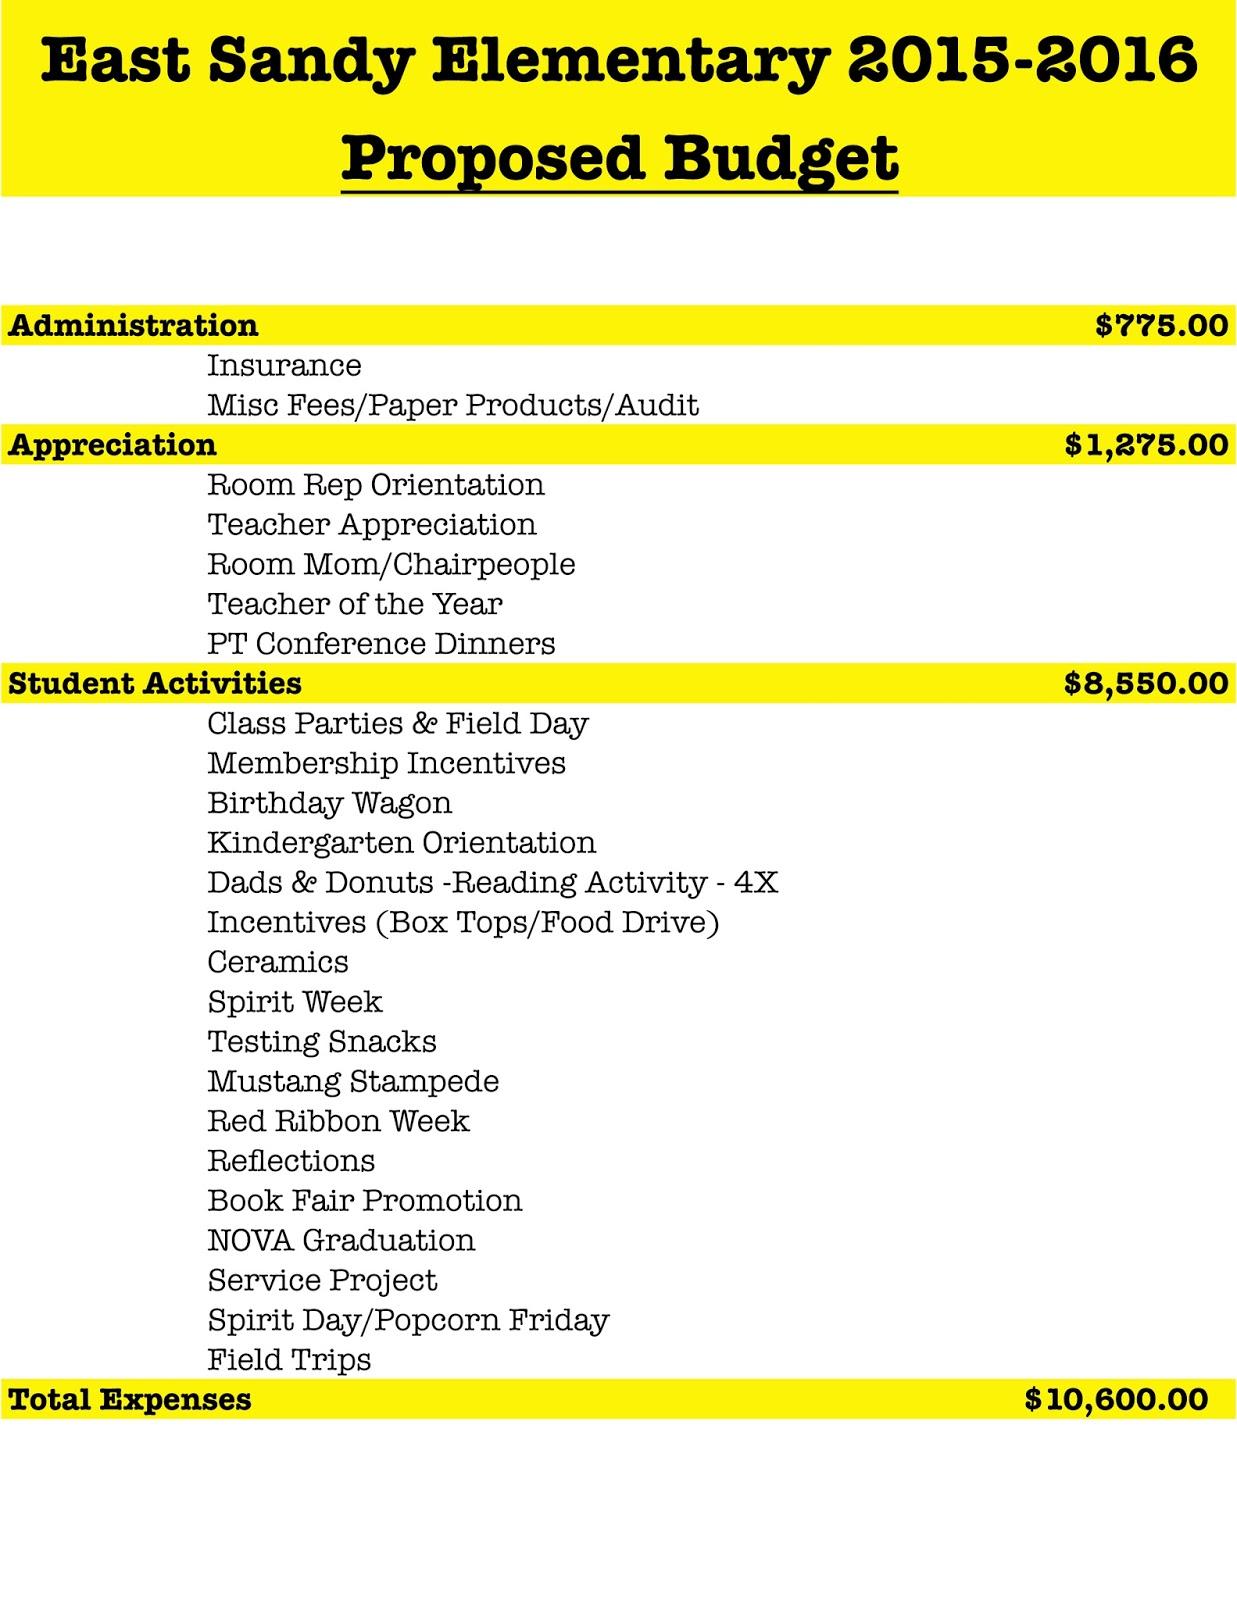 East Sandy Pta 2015 16 Pta Budget